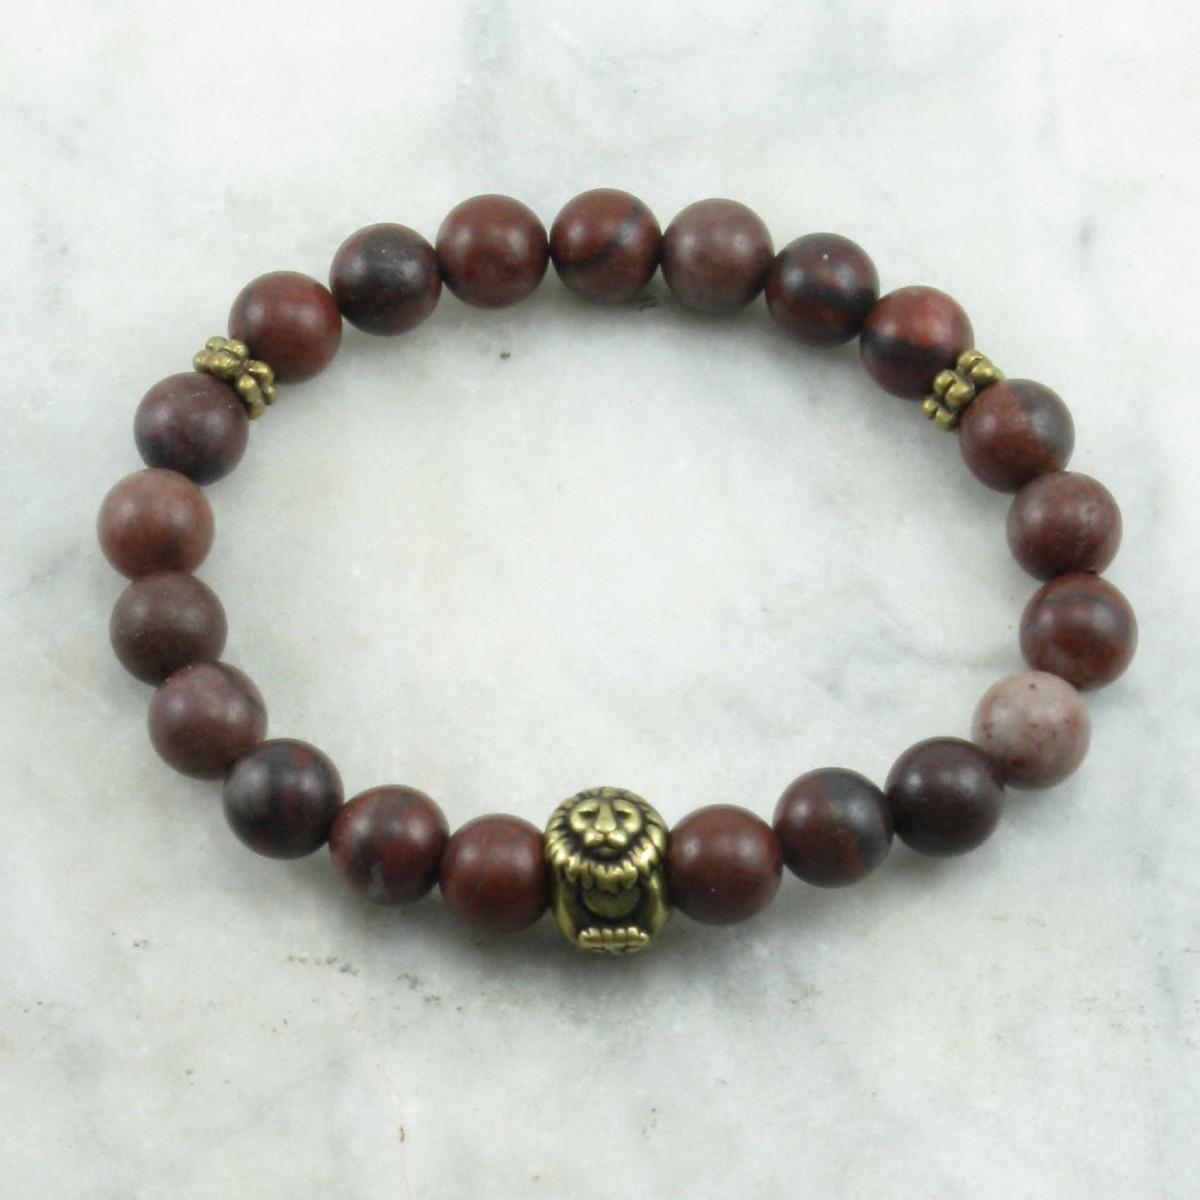 Simha_Mala_Bracelet_21_Red_Jasper_Mala_Beads_Buddhist_Bracelet